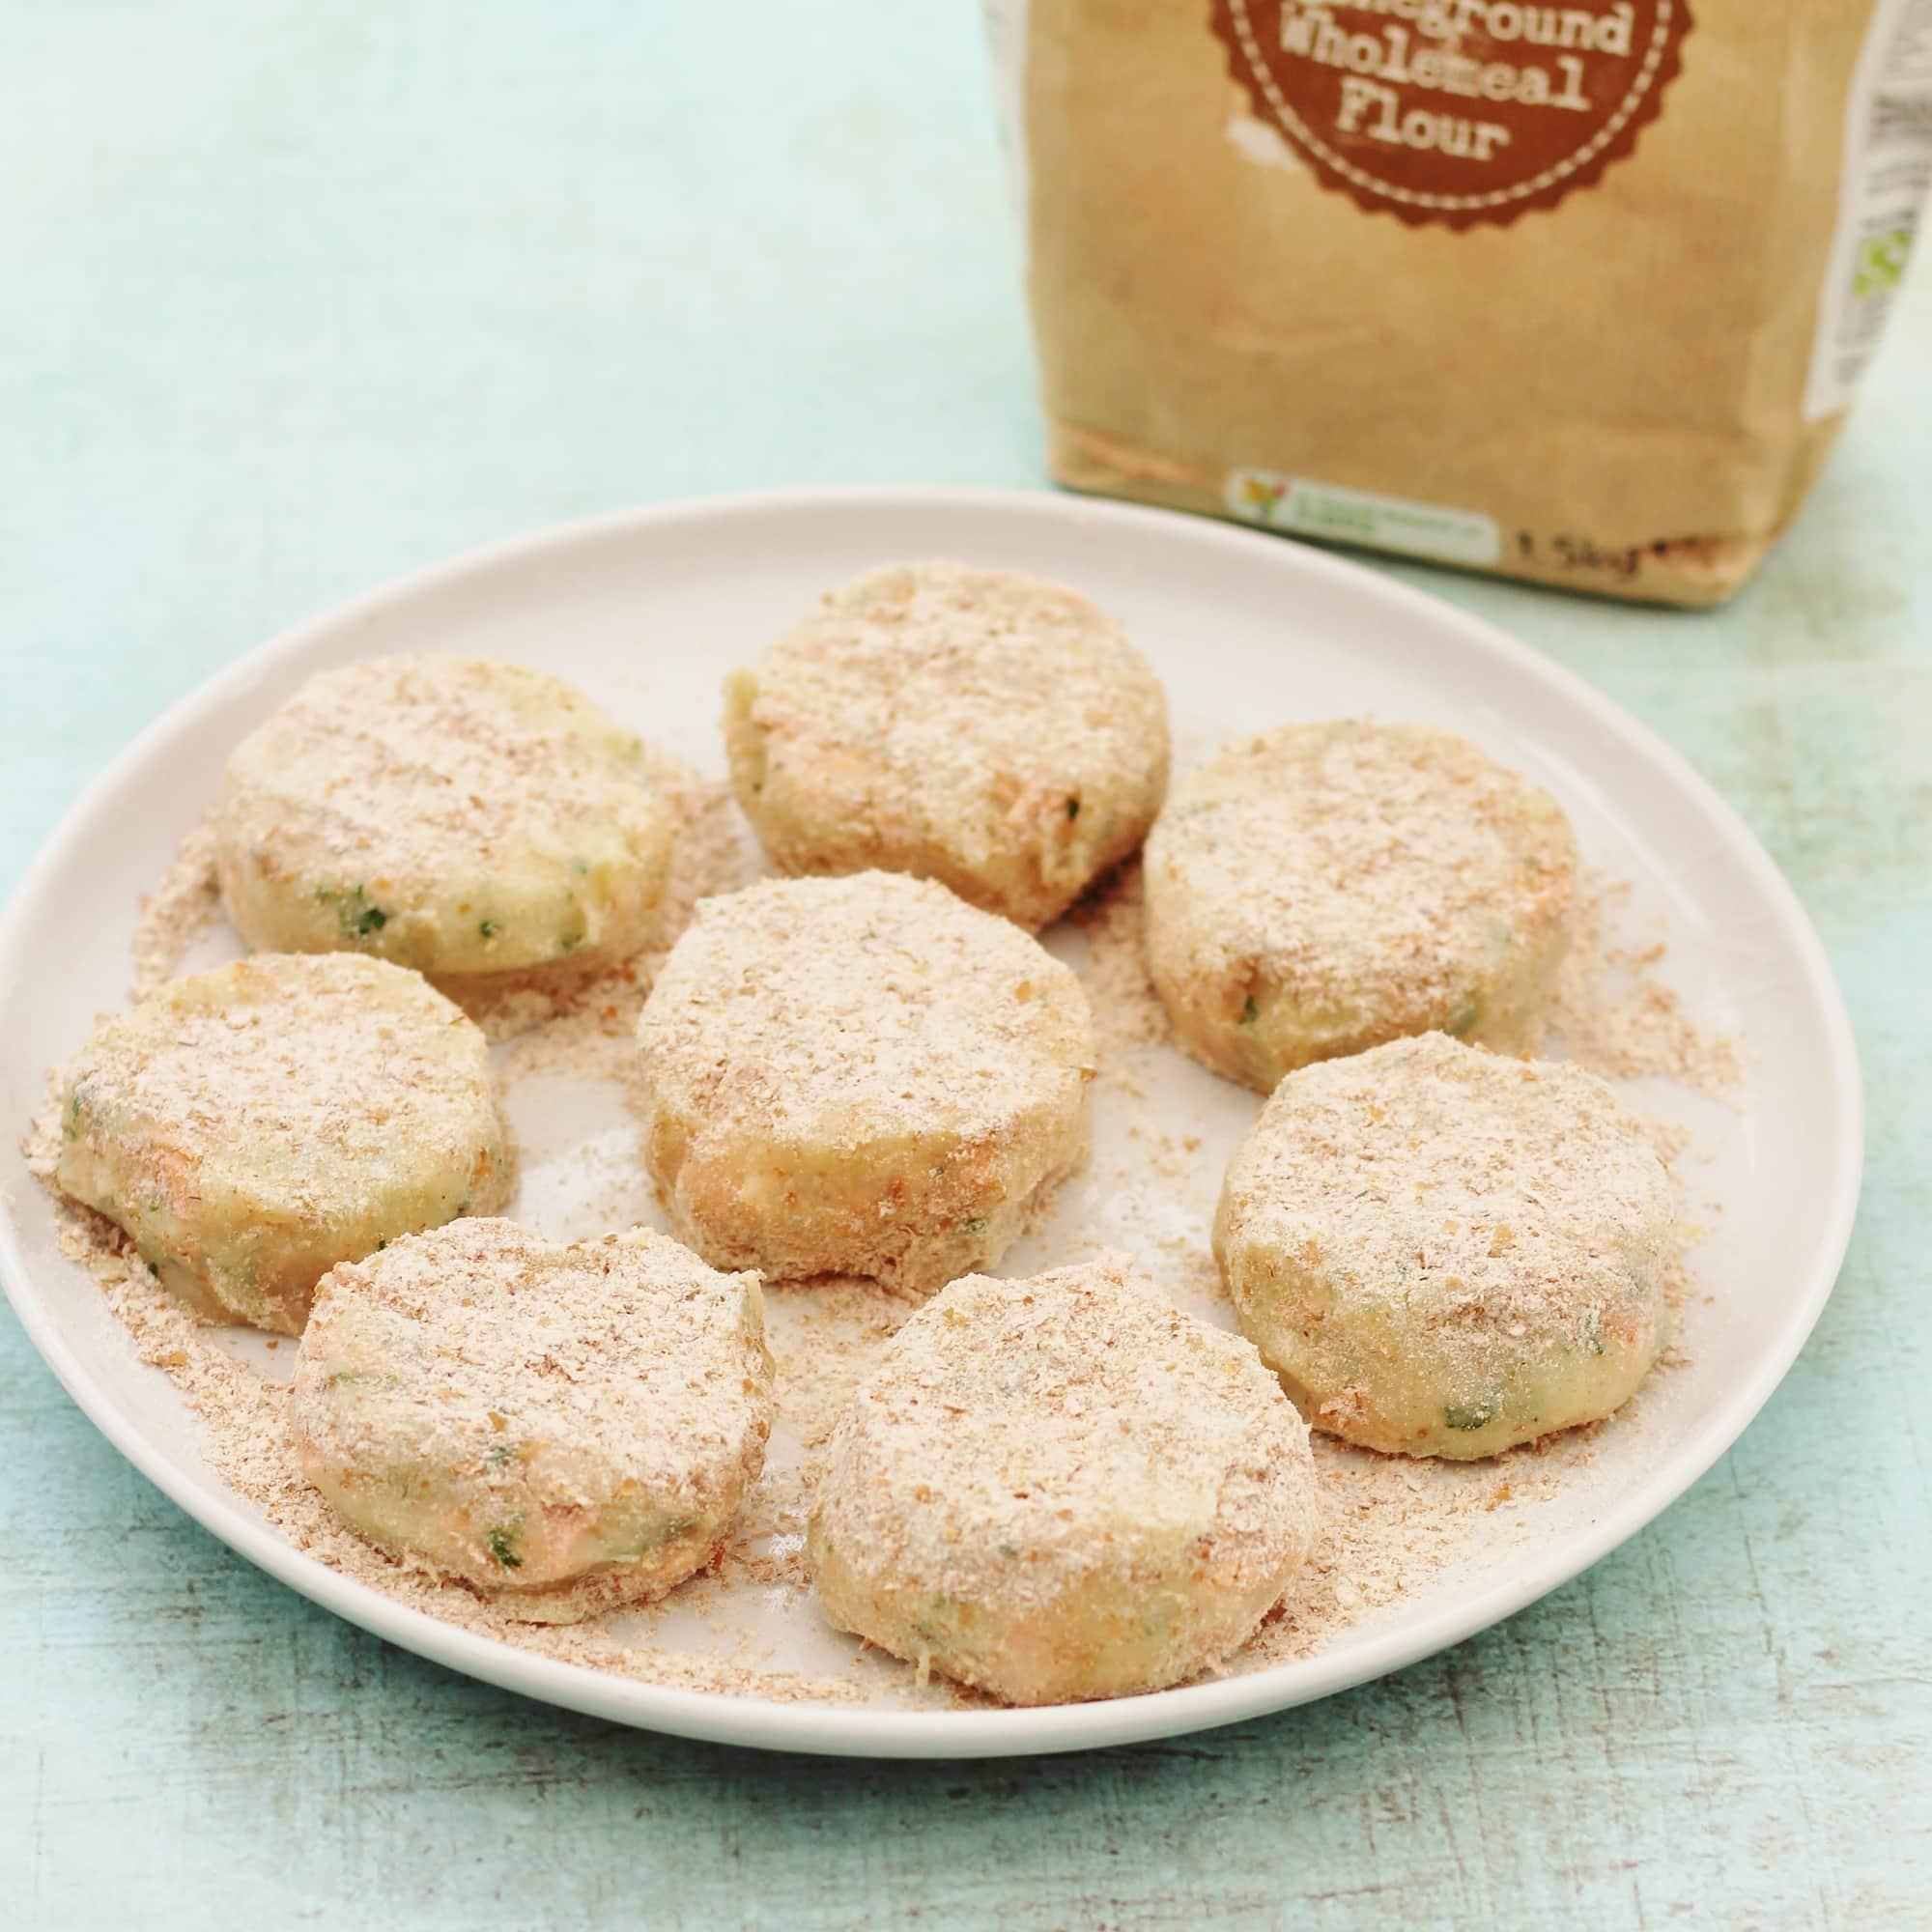 Easy Salmon And Parsley Fishcakes Recipe